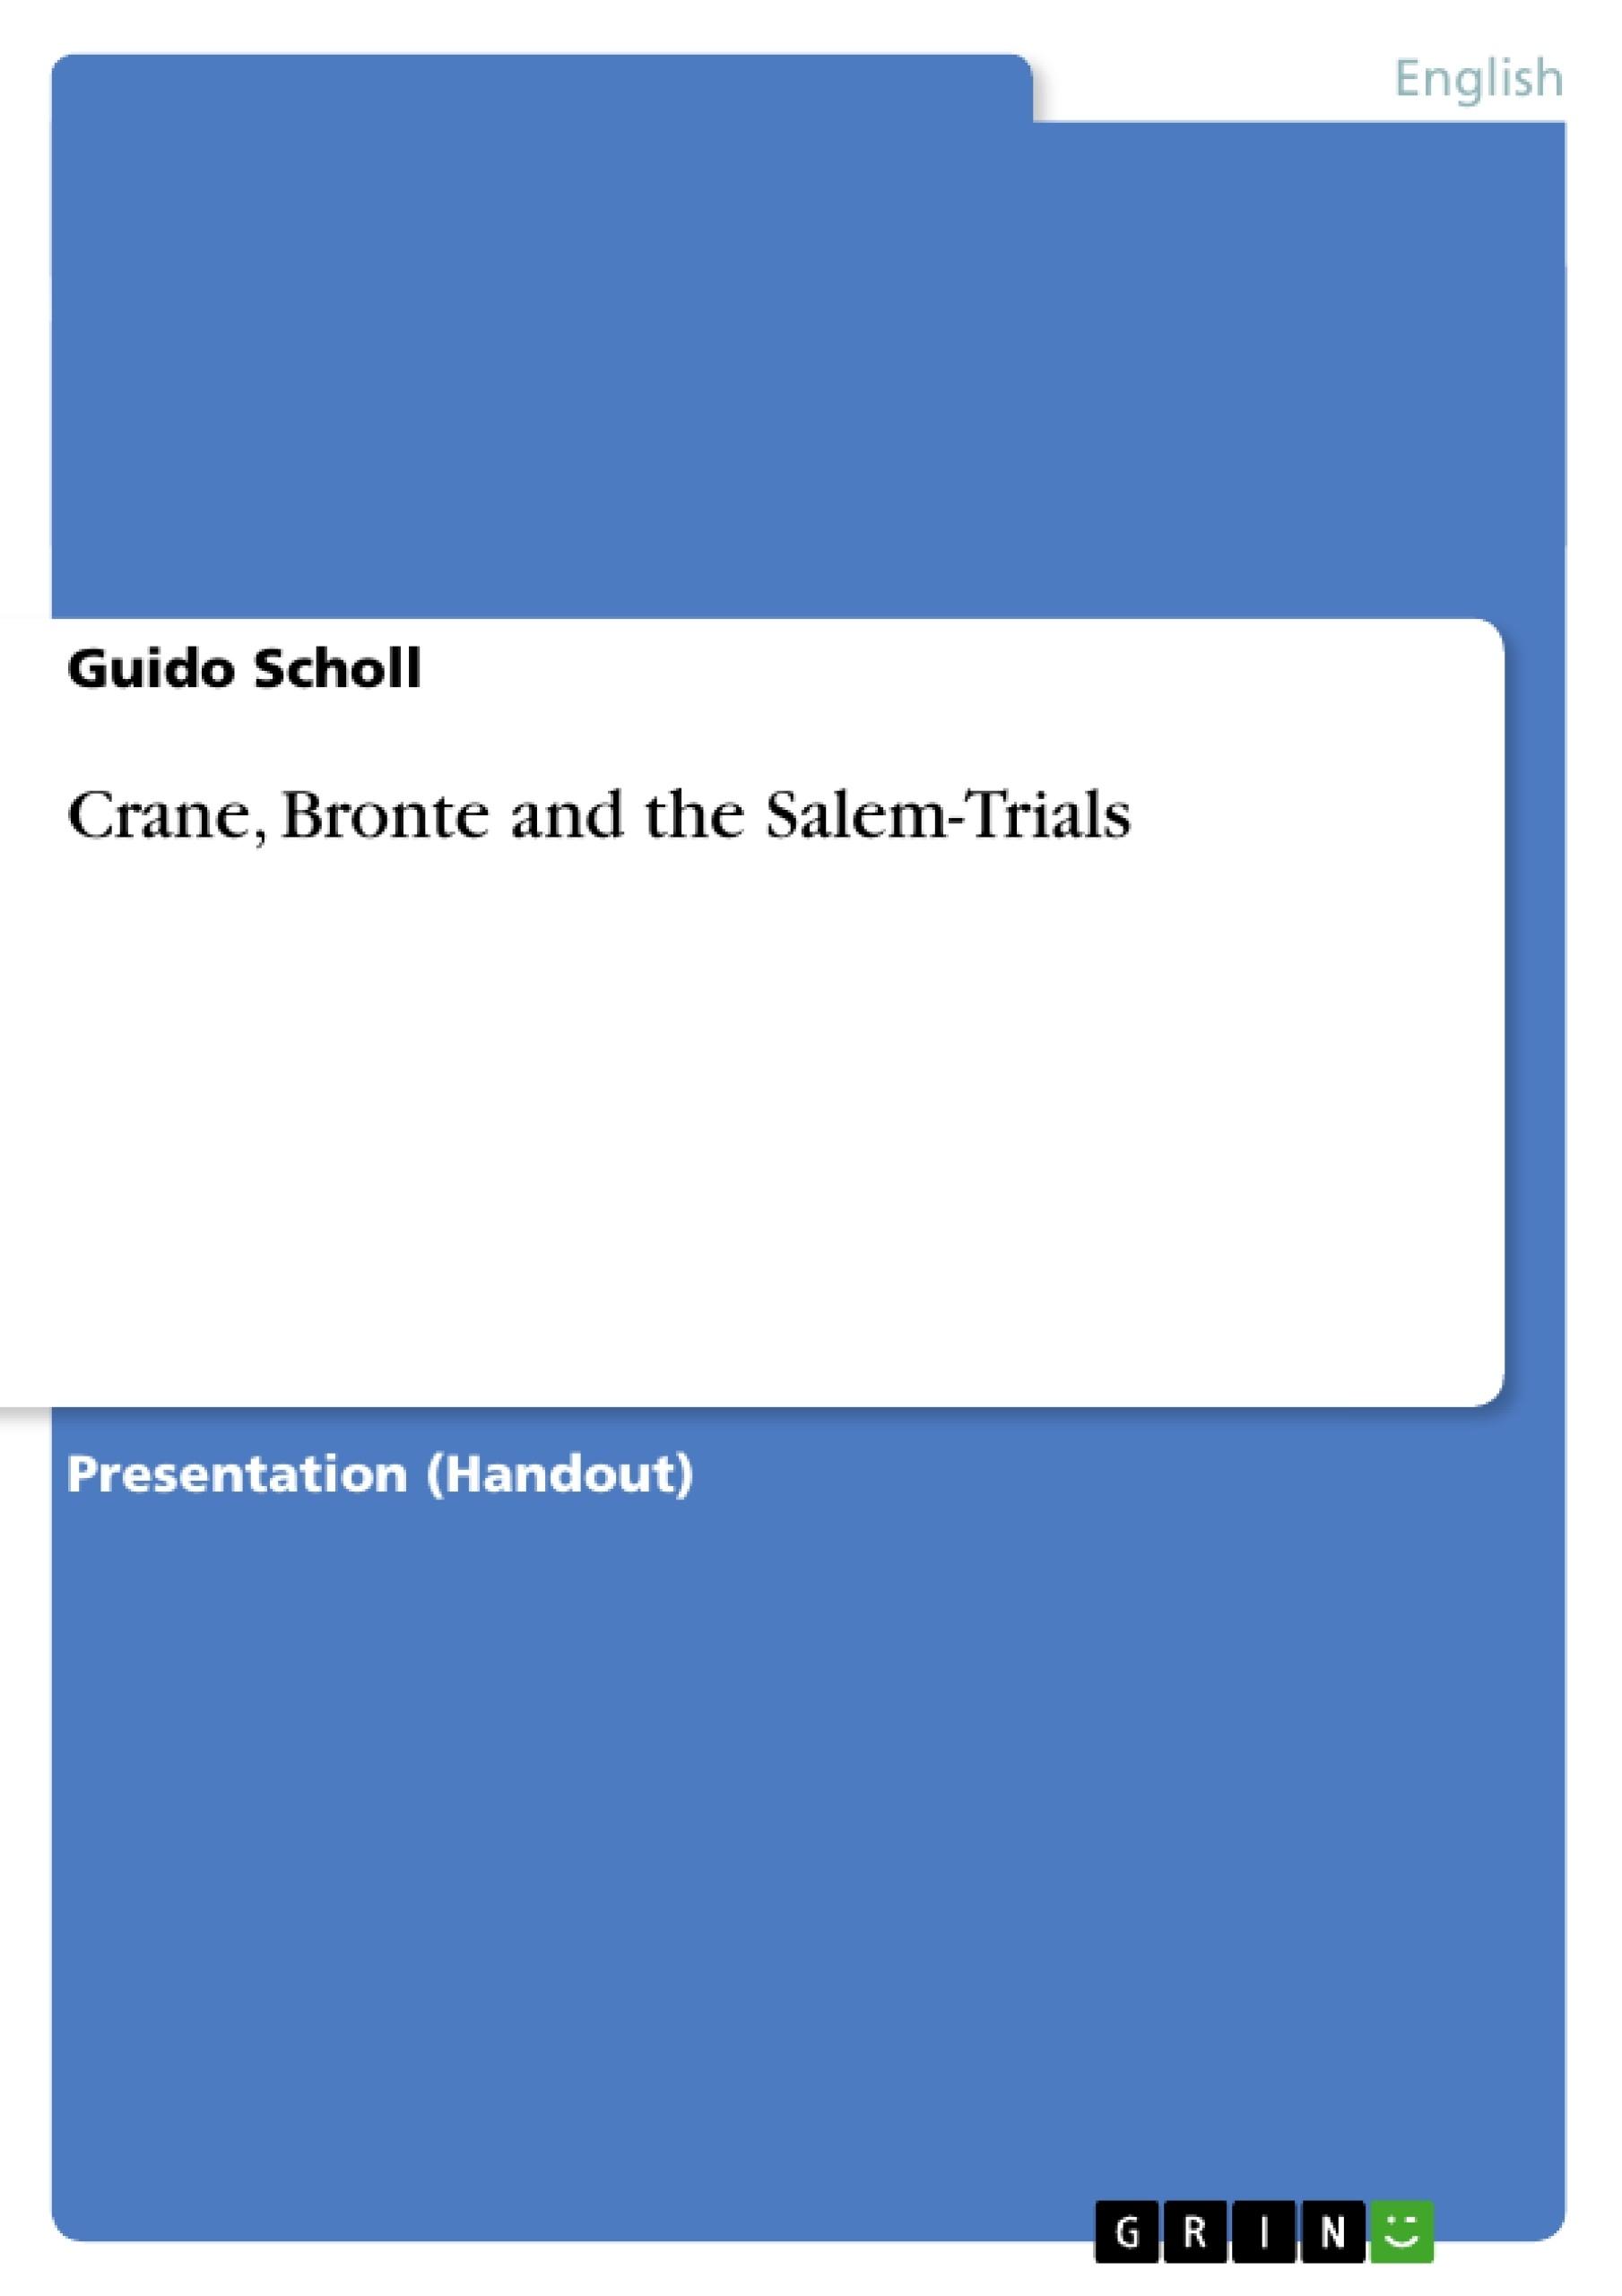 Title: Crane, Bronte and the Salem-Trials